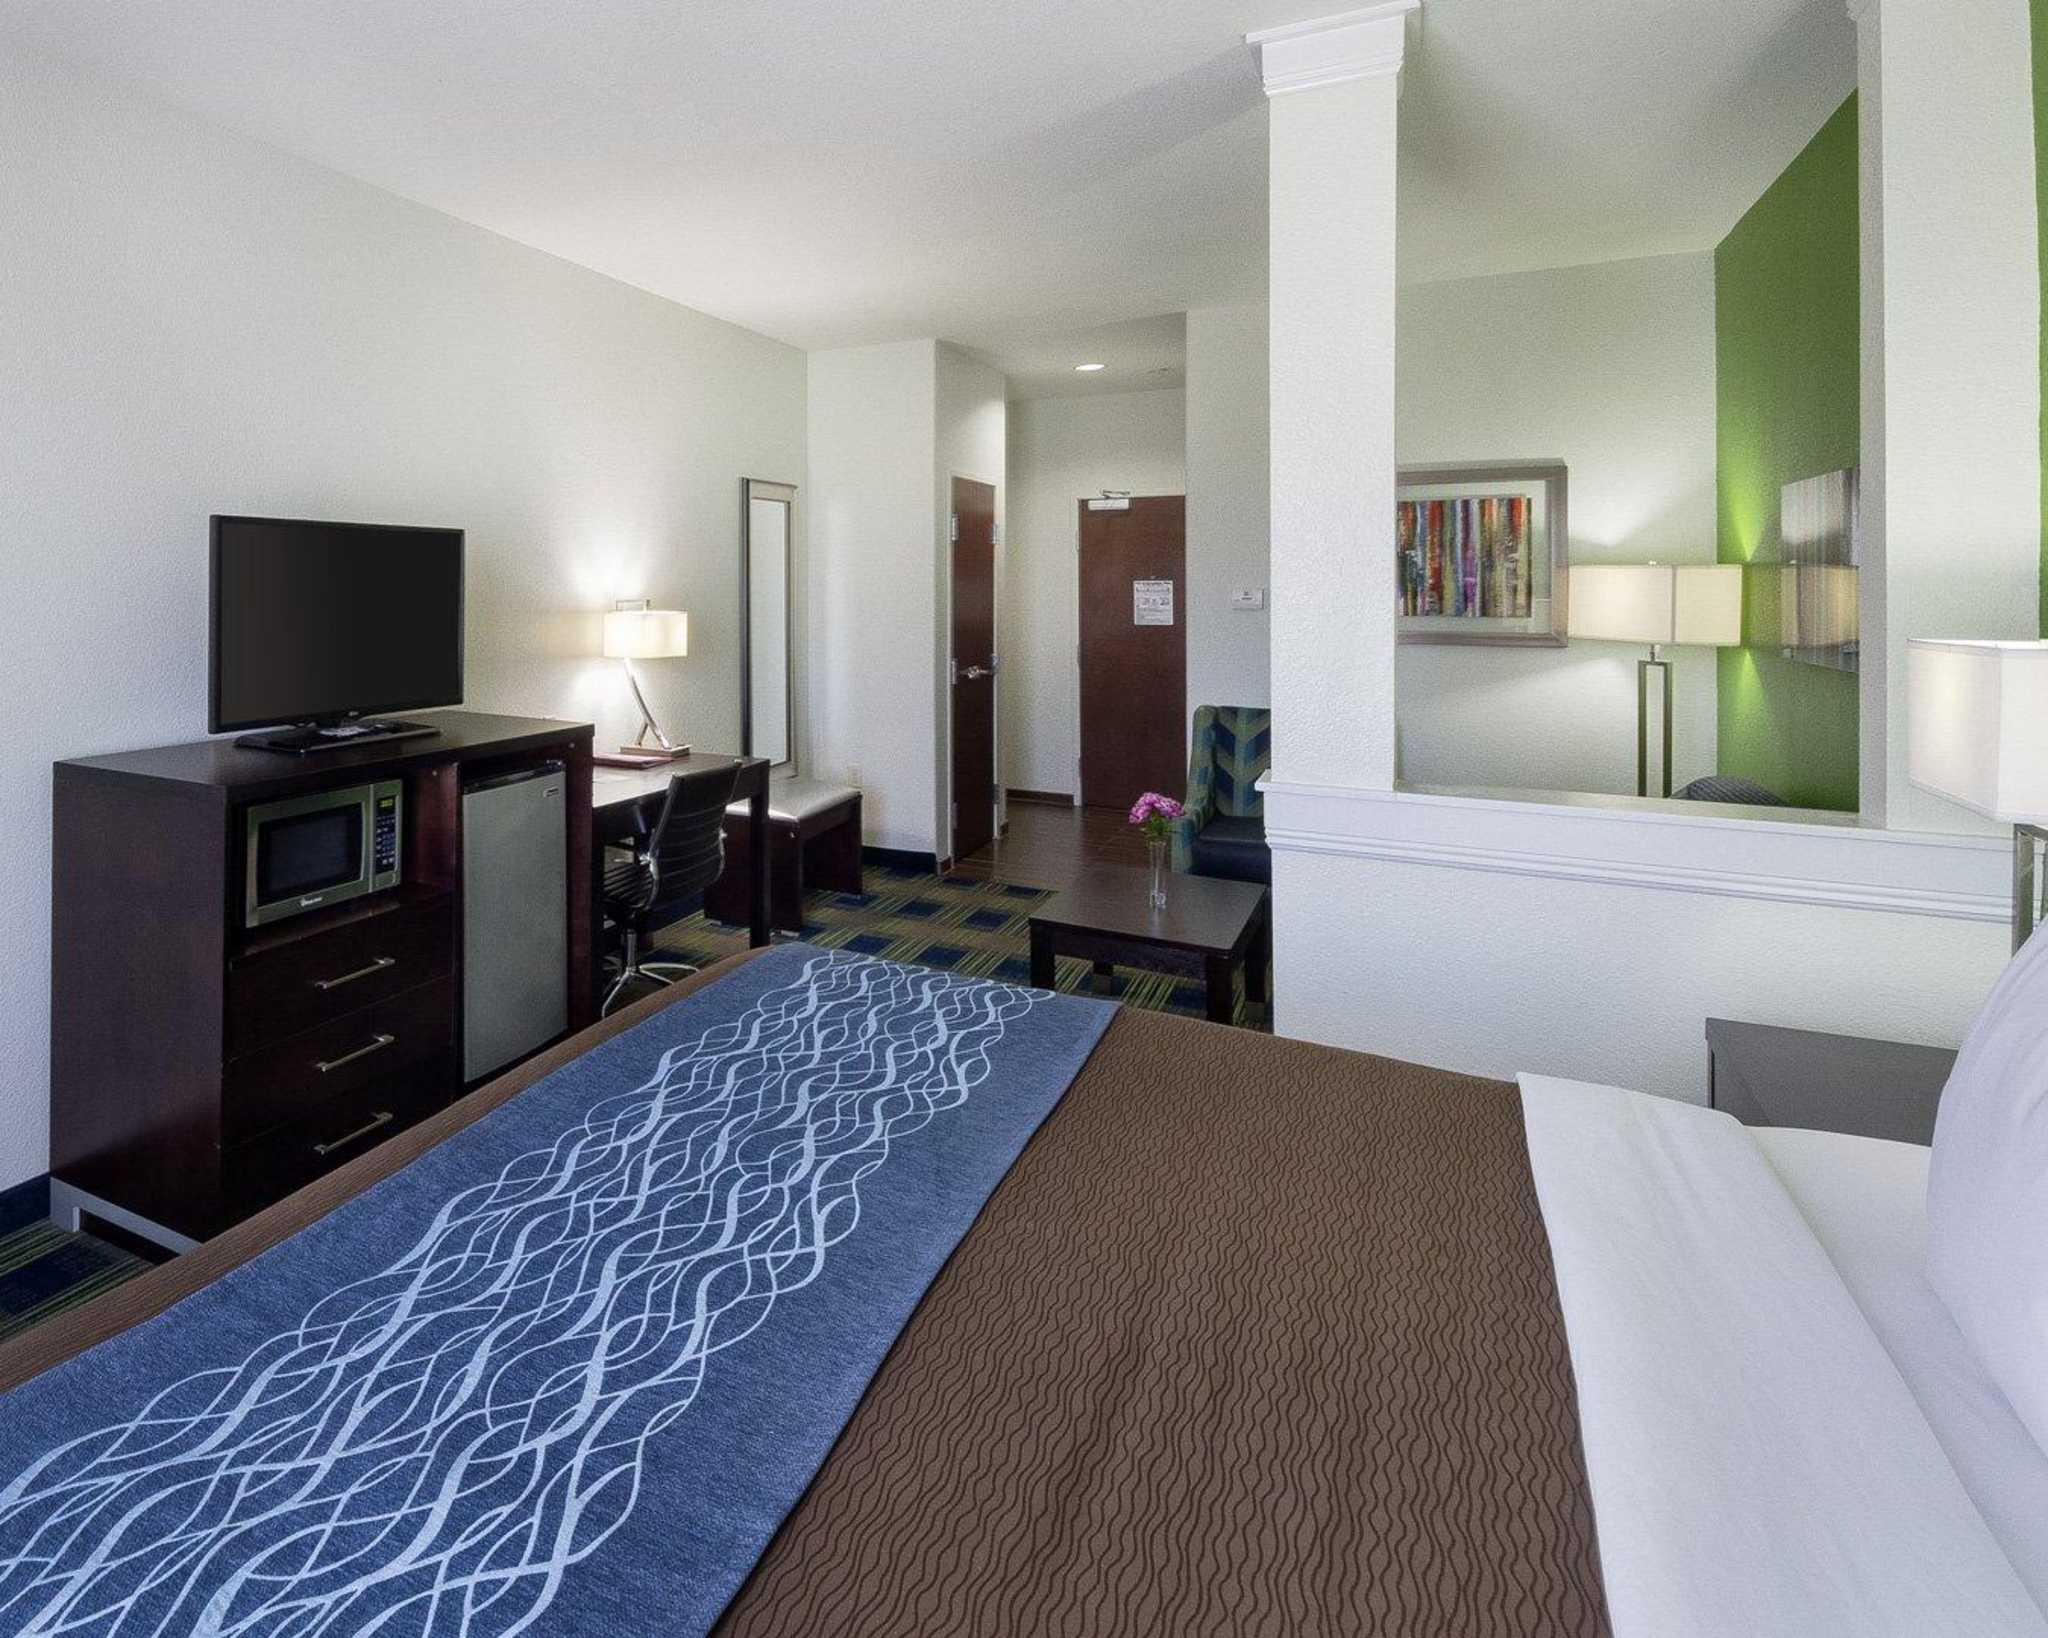 Comfort Inn & Suites image 21